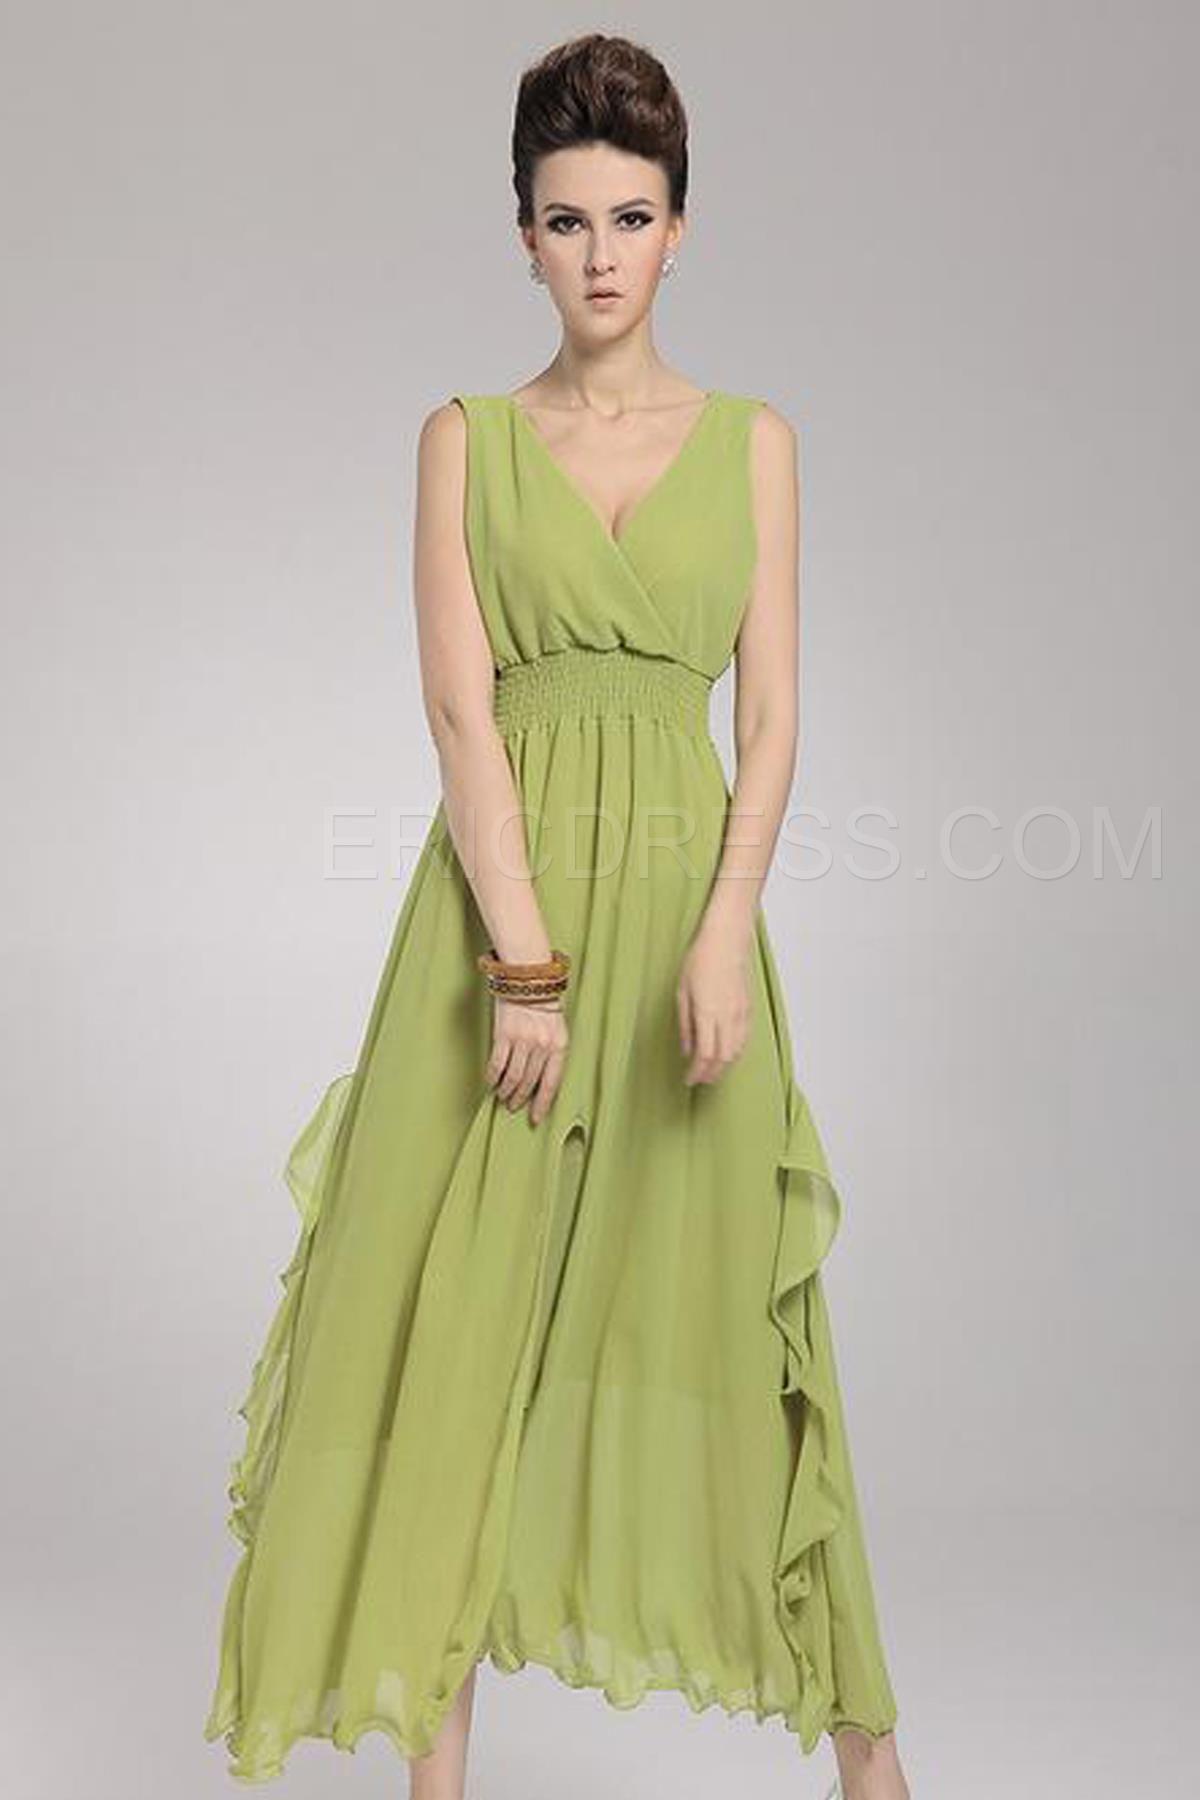 Evening stylish maxi dresses photos